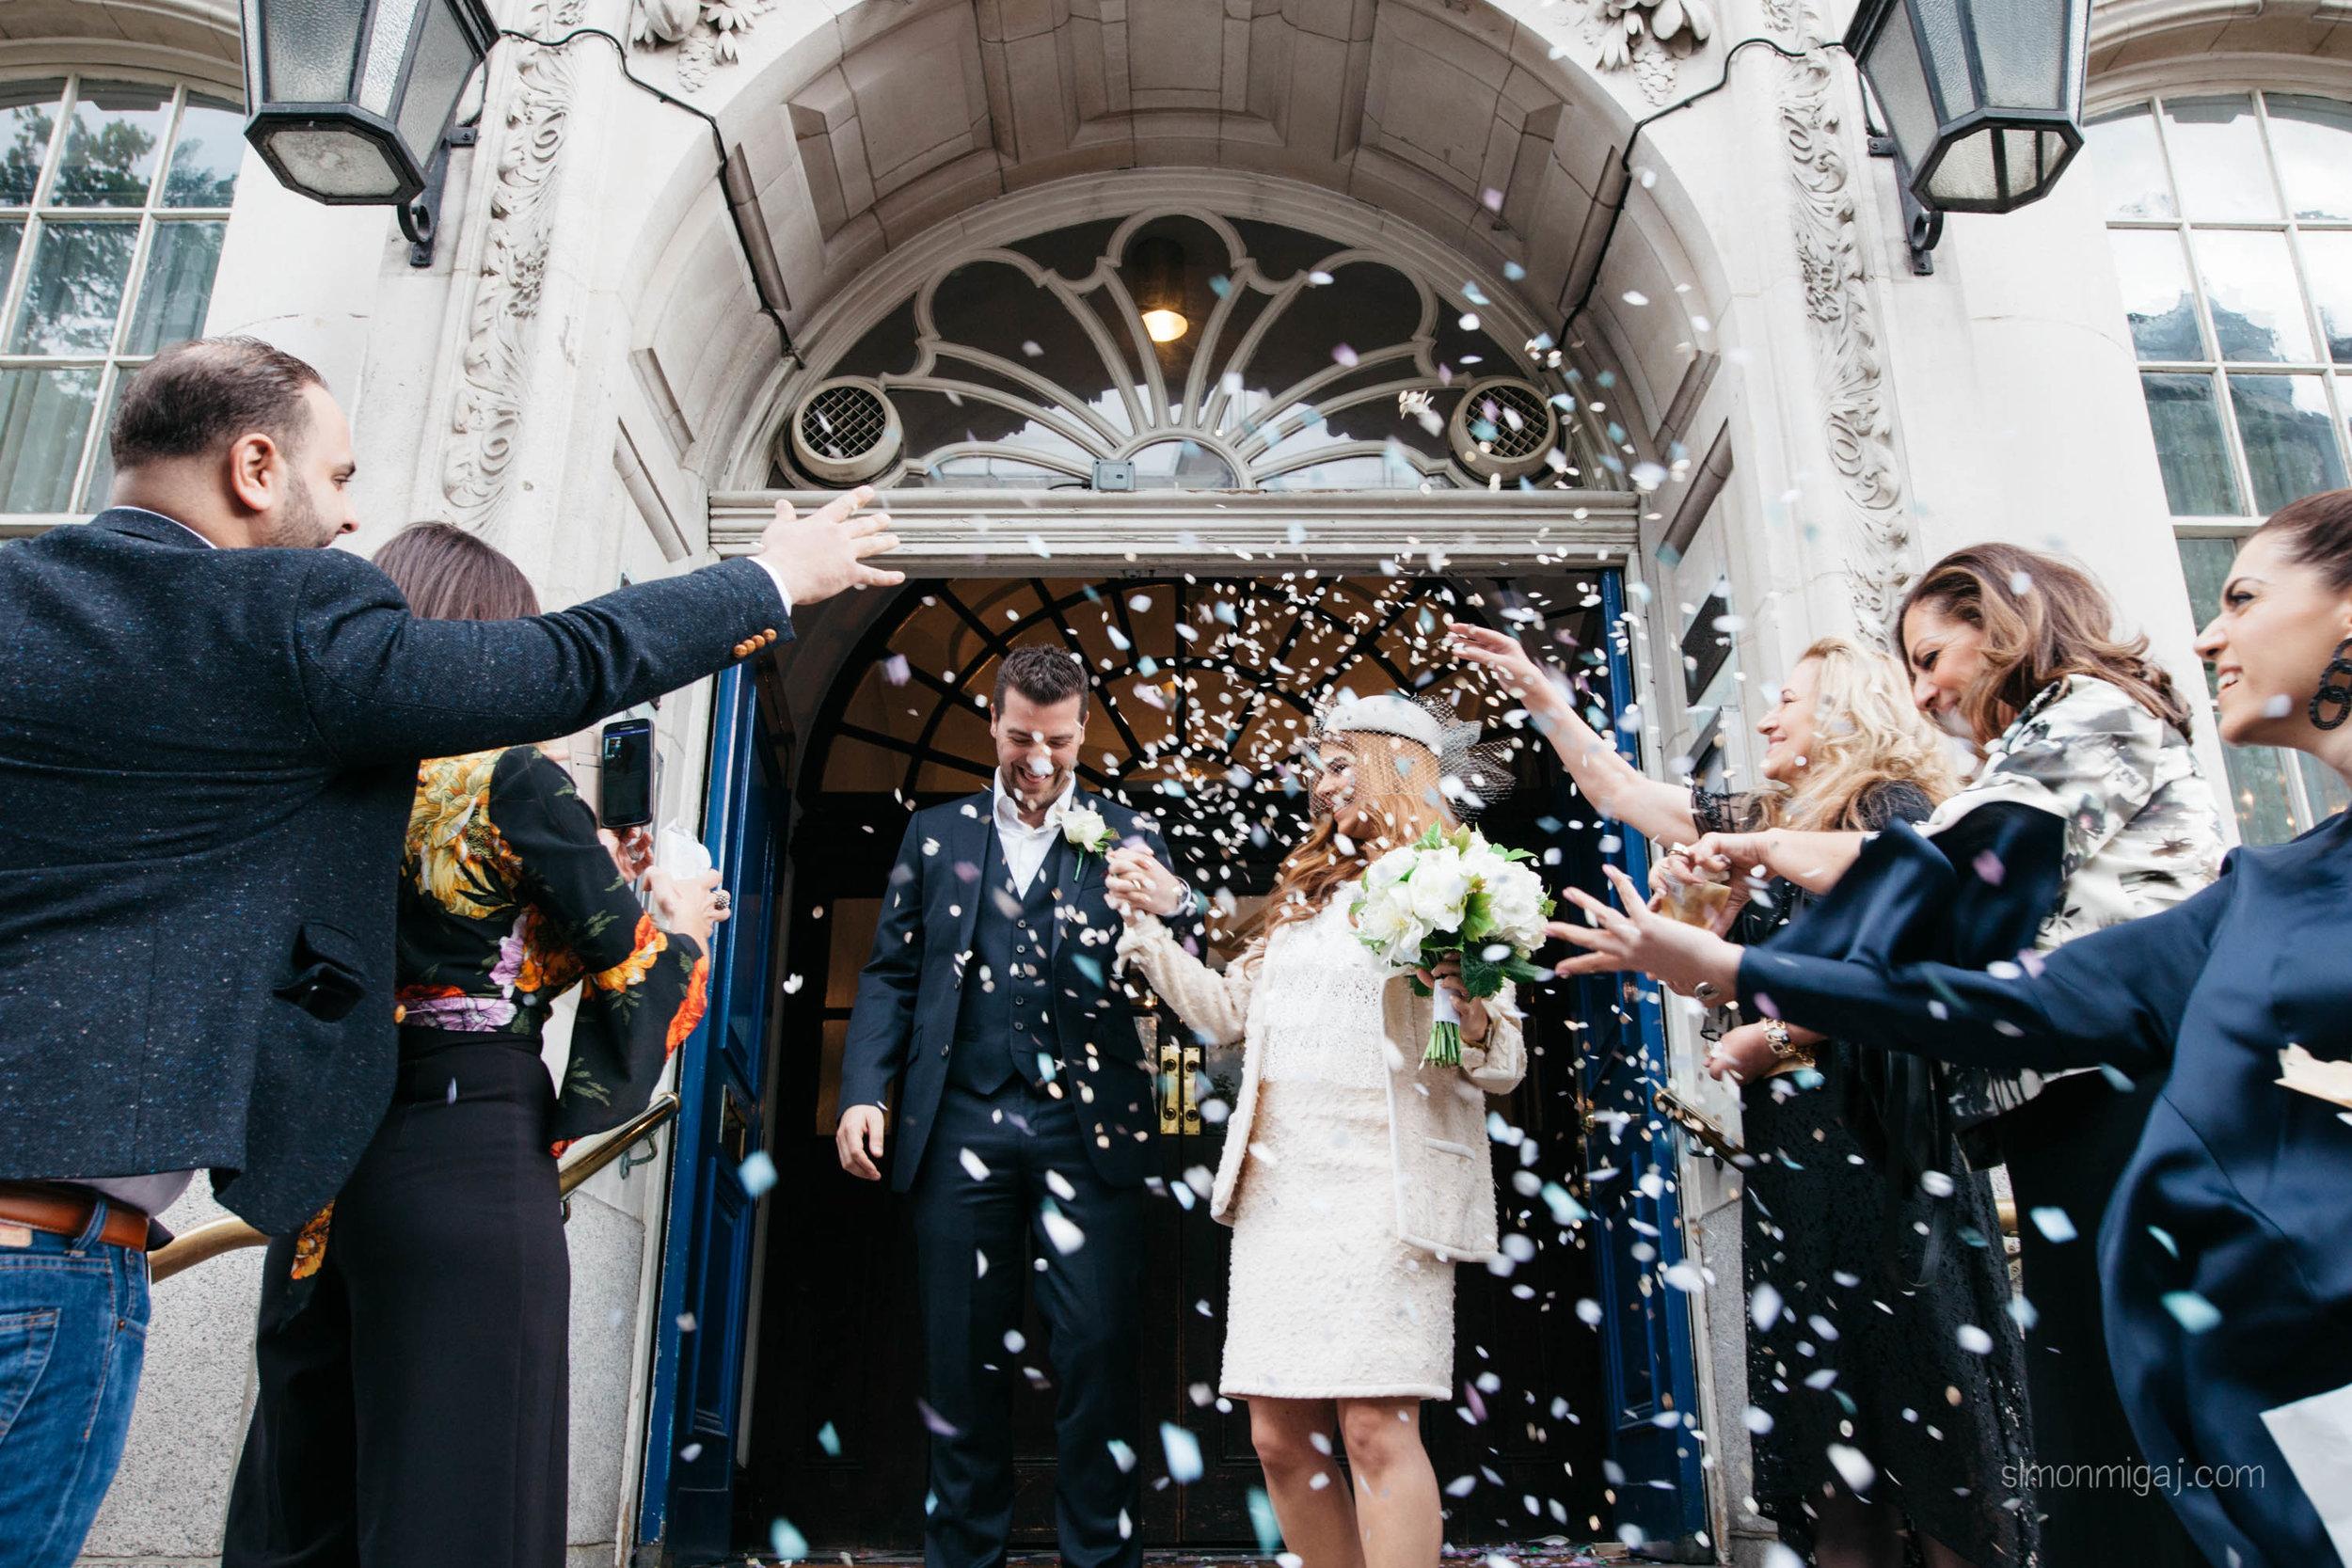 WeddingPhotography_AgathaStavros.jpg